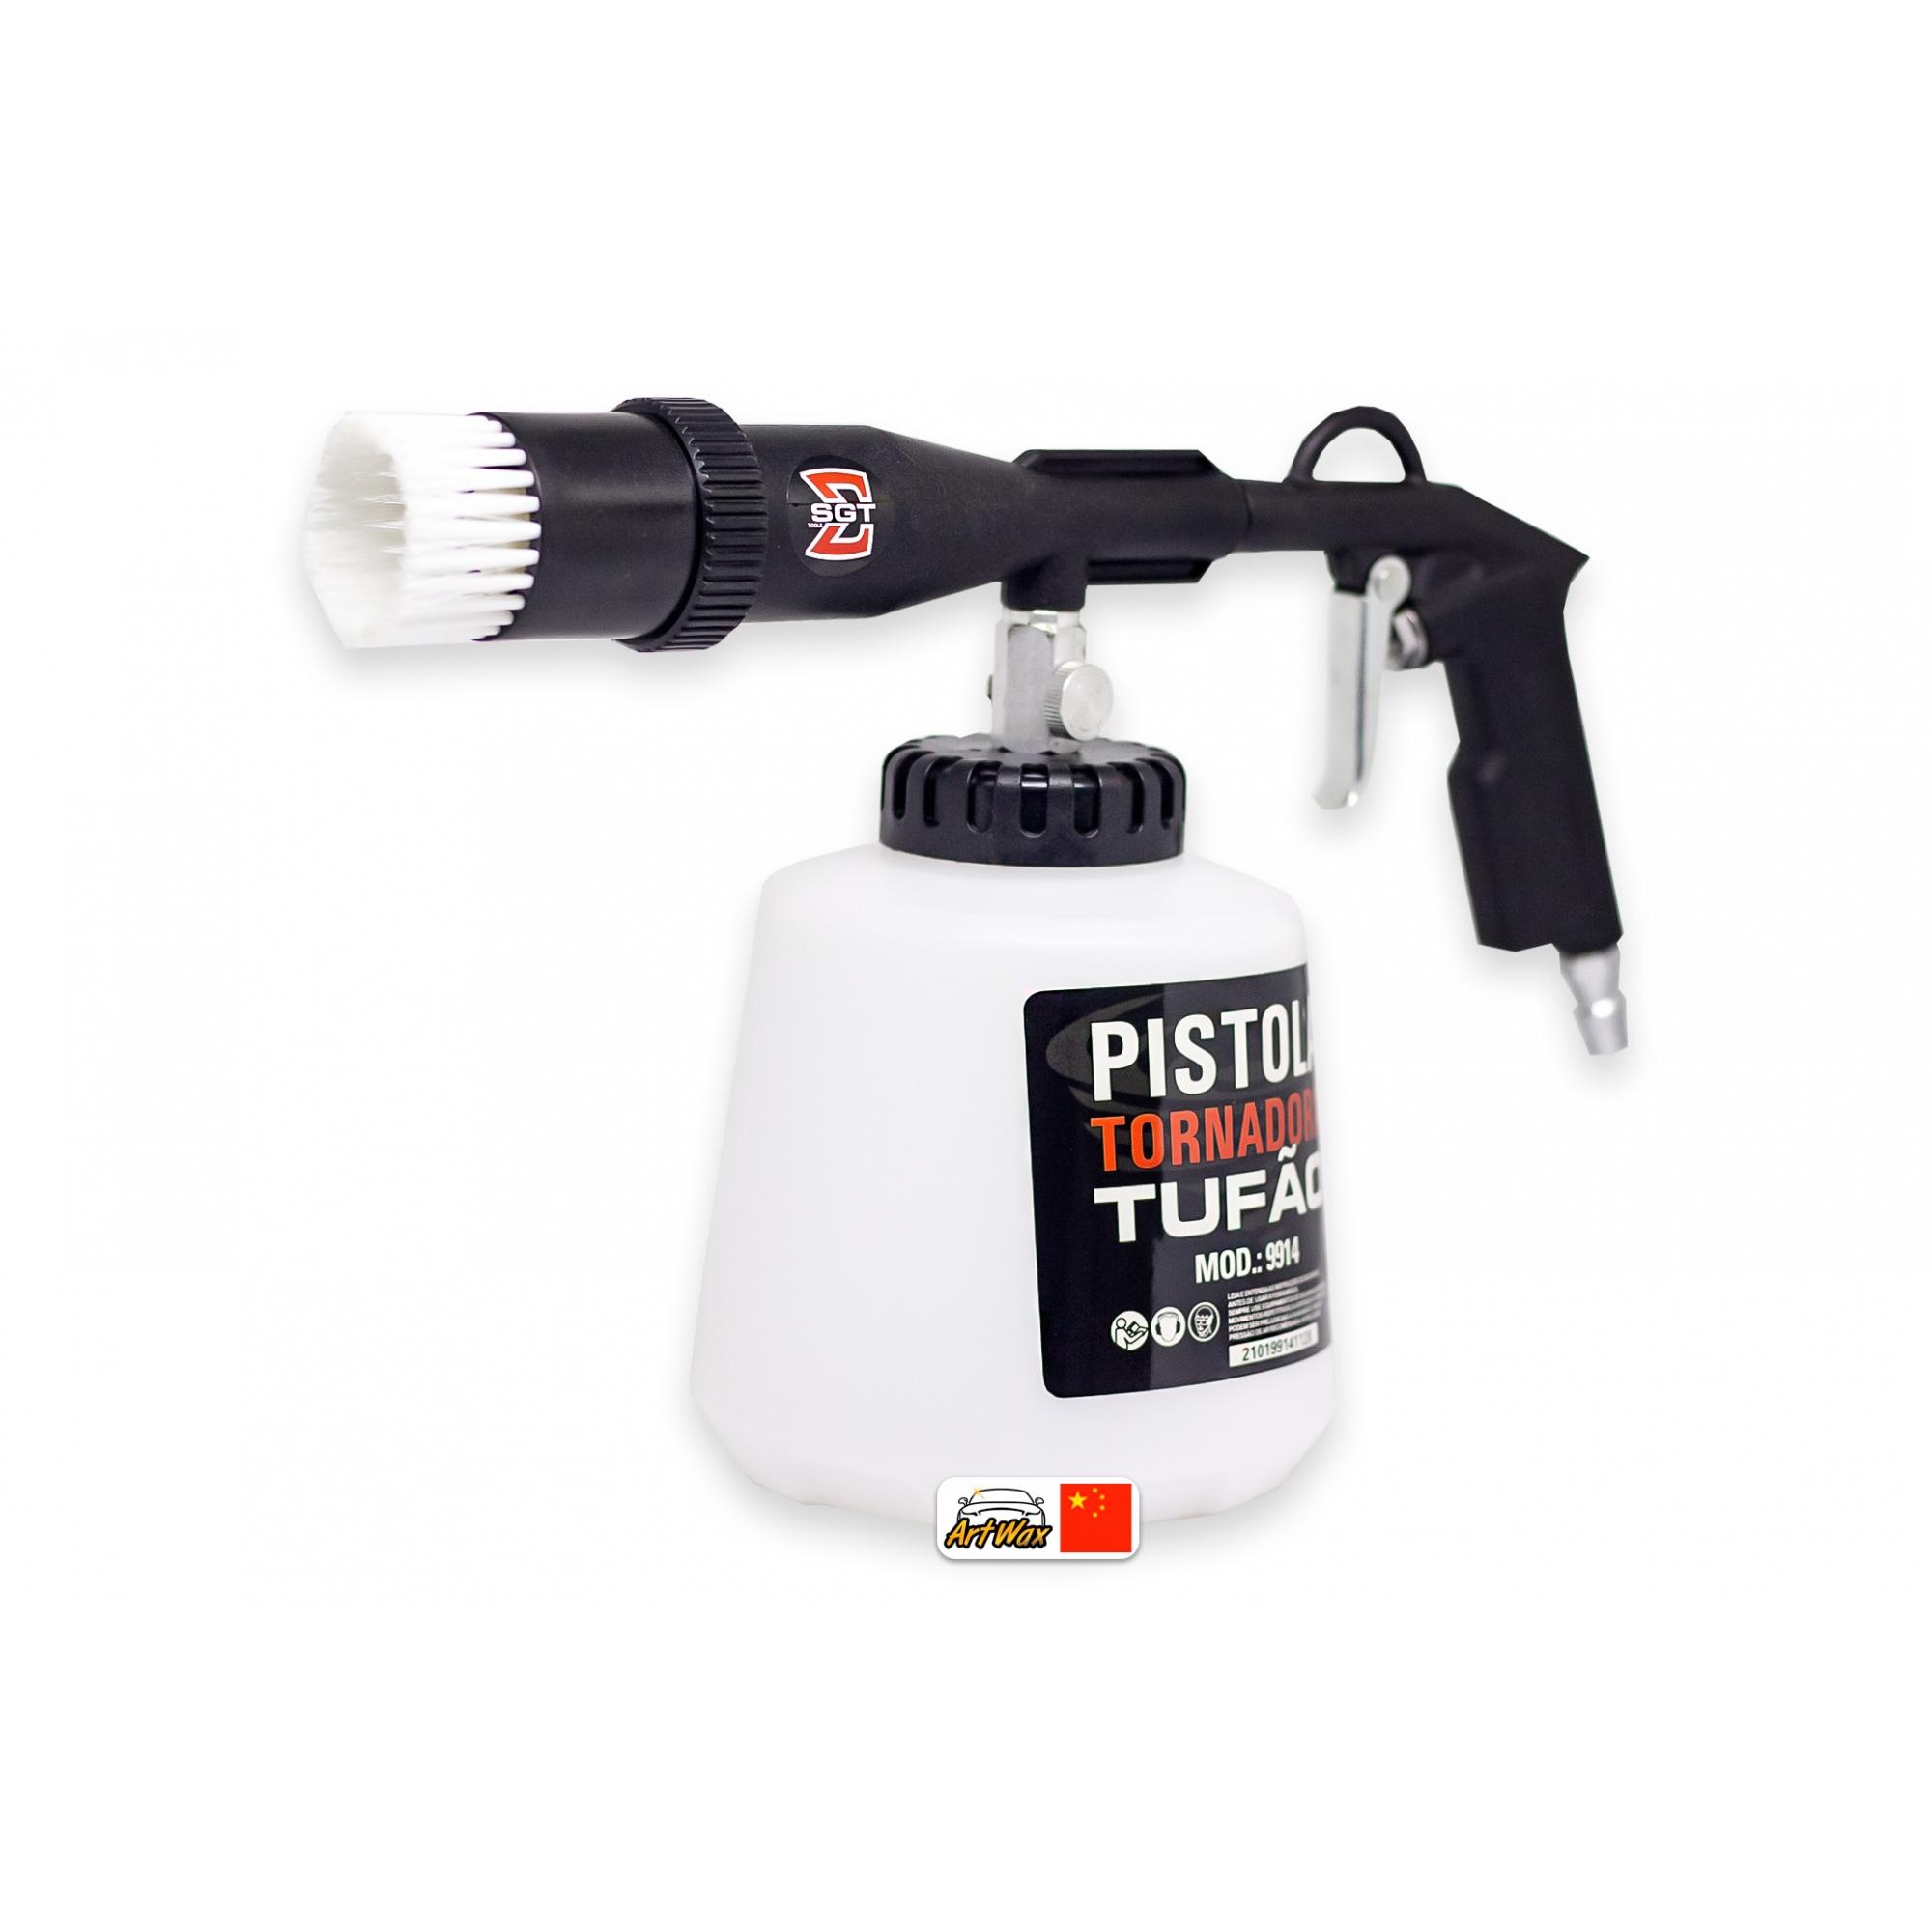 Pistola Tornadora Tufão 1L -  SGT 9914 Sigma Tools